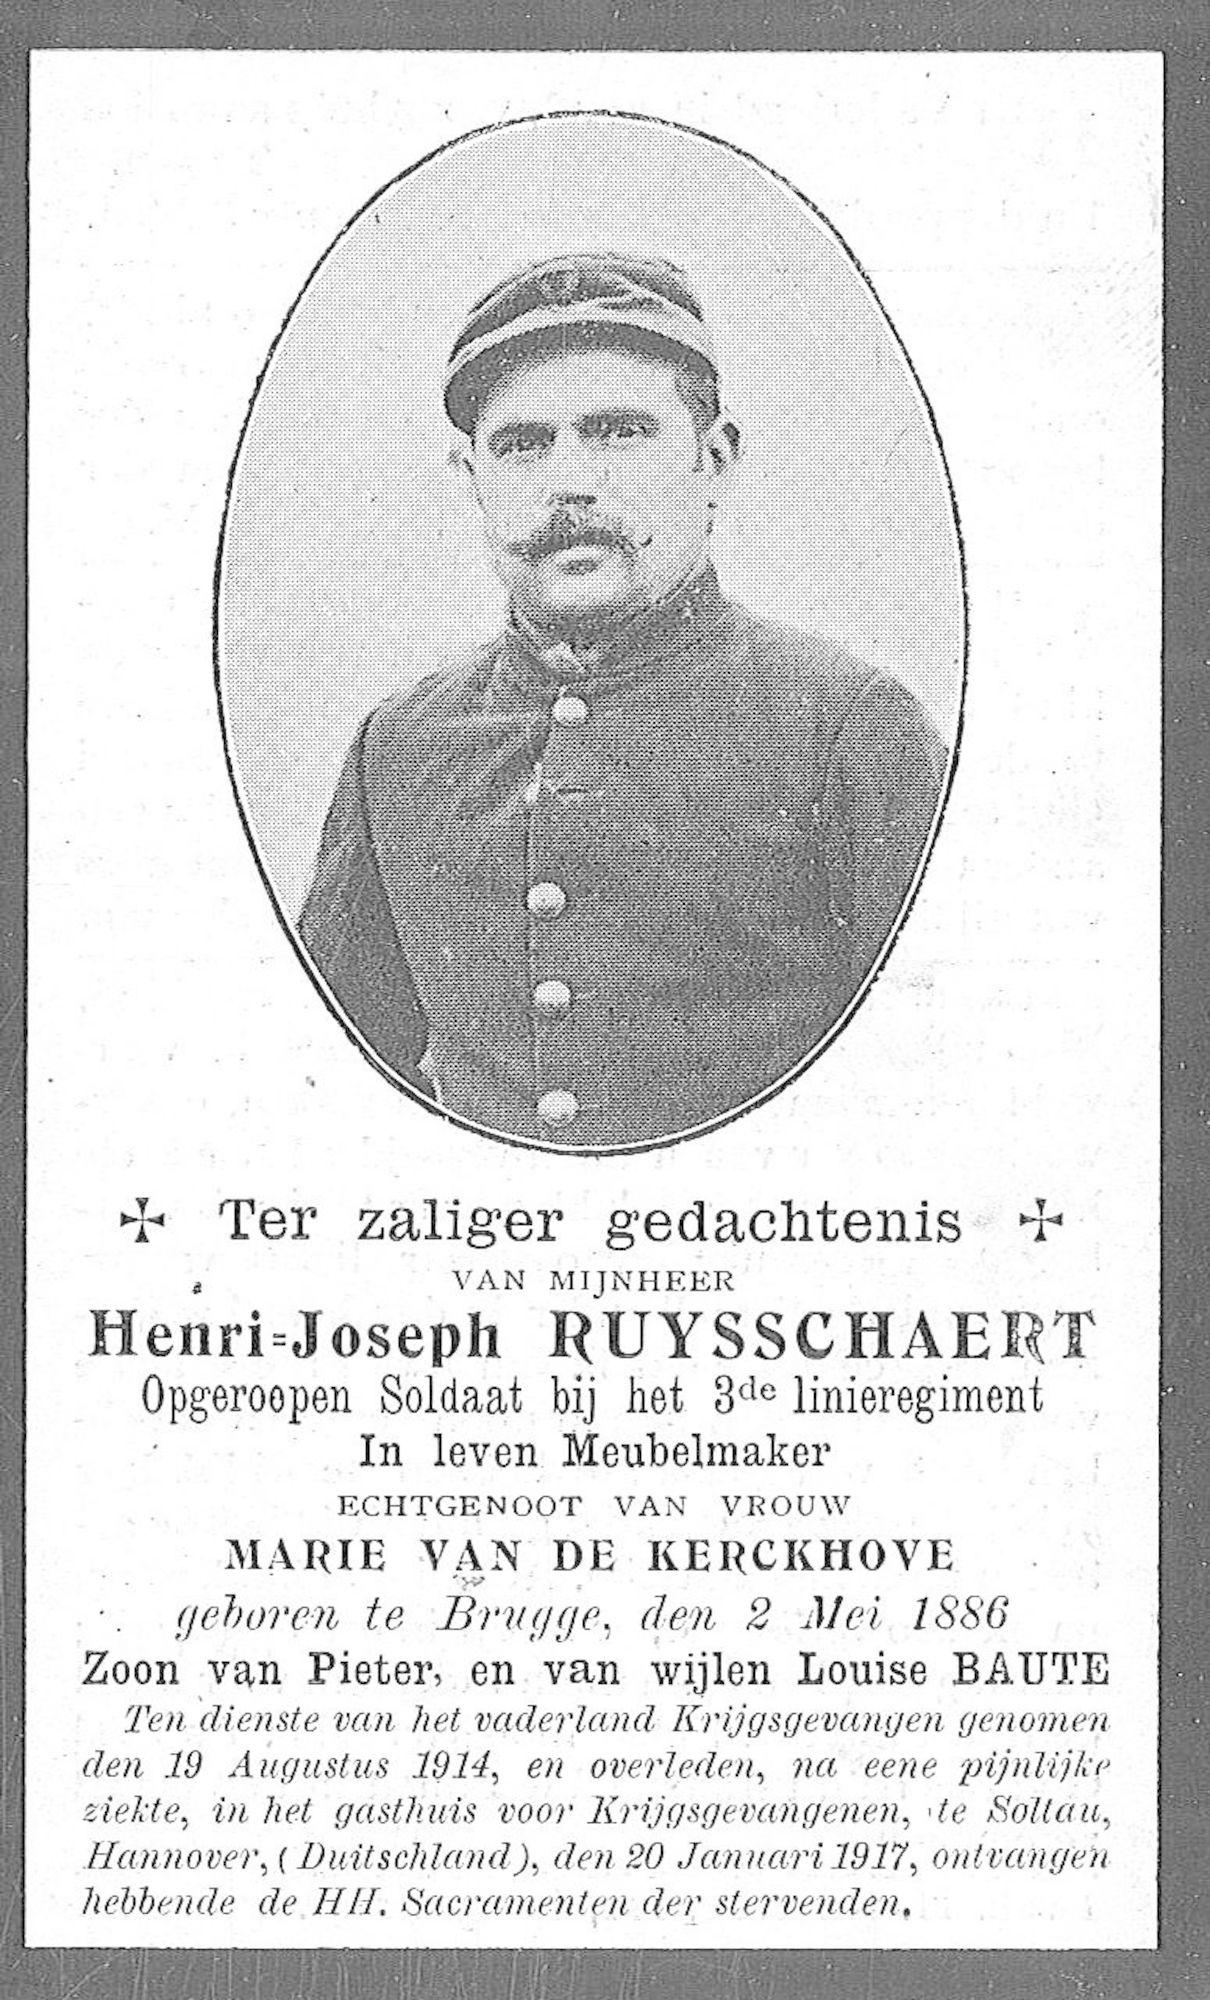 Ruysschaert Henri-Joseph